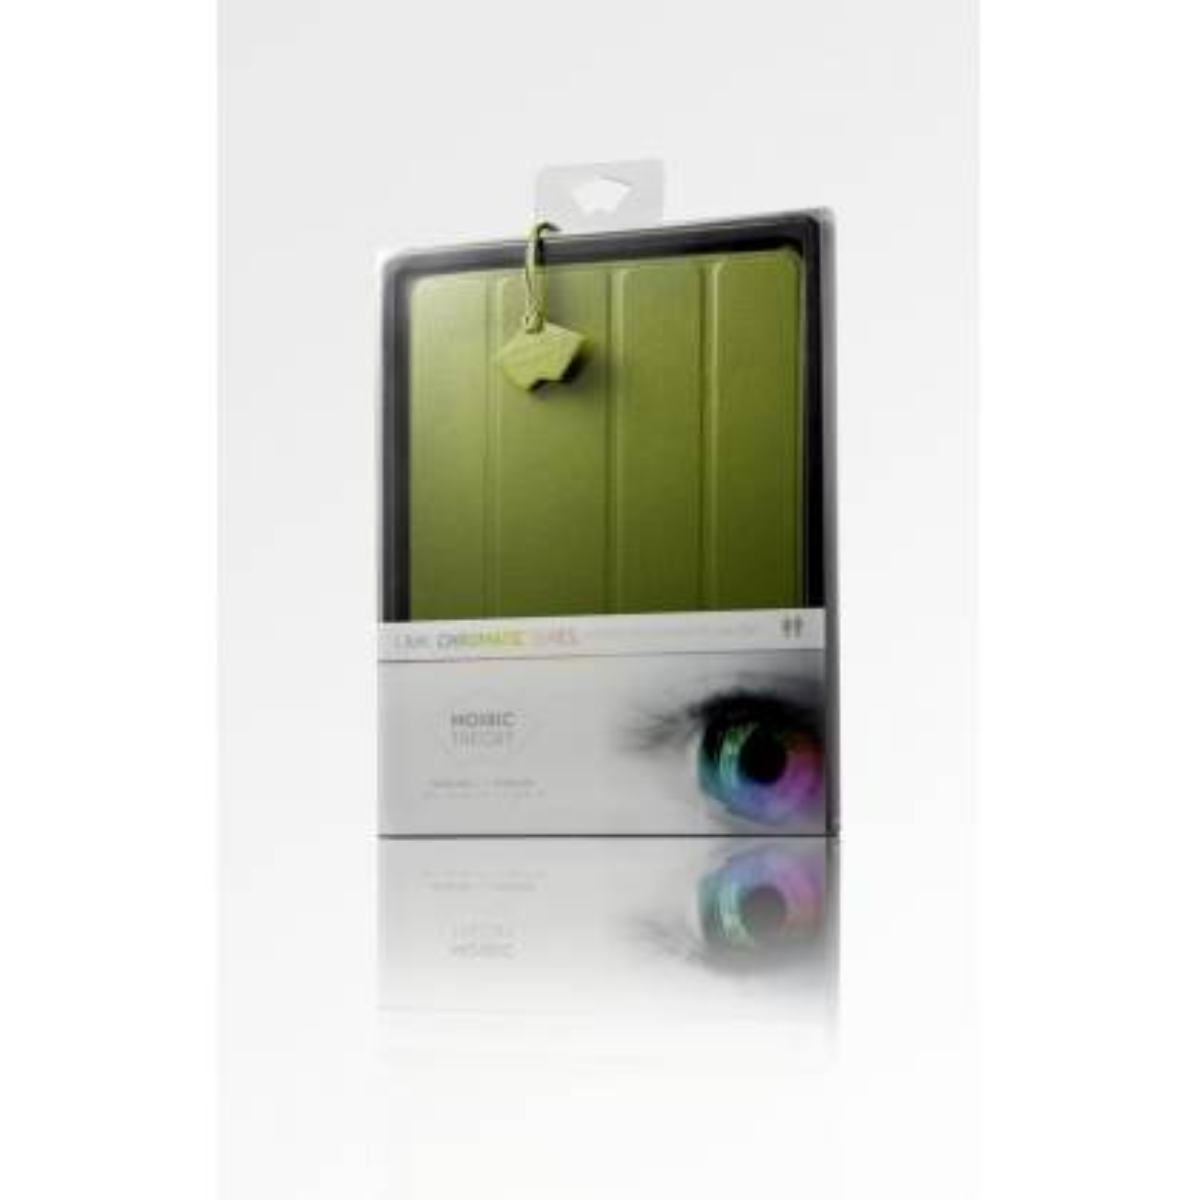 Mosaic Theory Housse etui de protection simili en cuir pour Apple iPad 2 / iPad 3 Vert